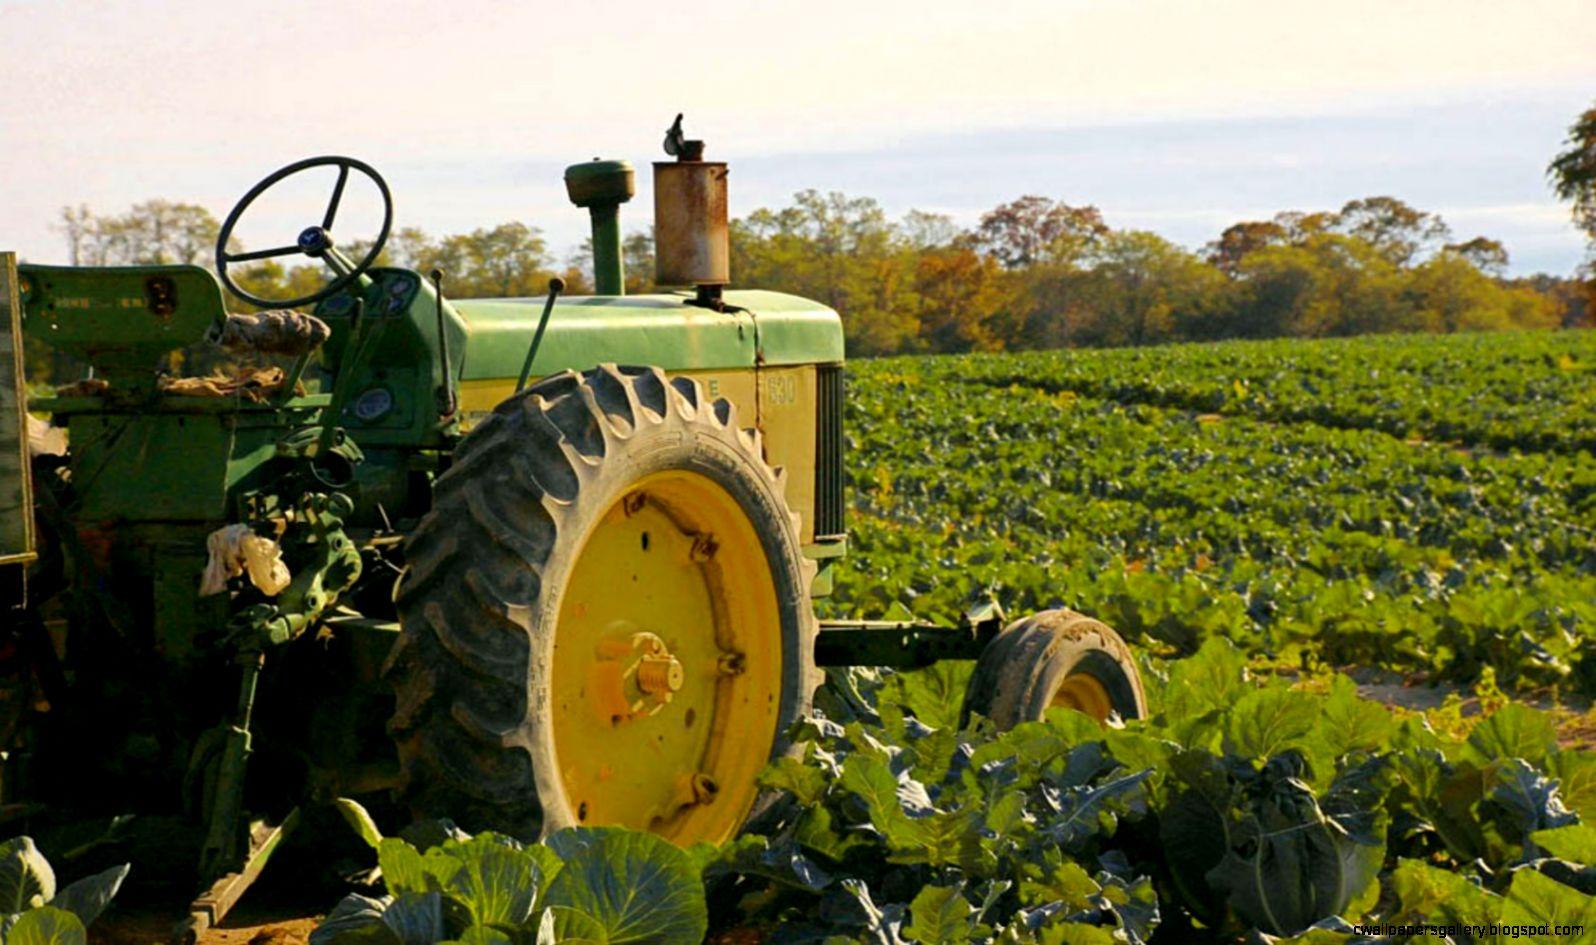 Farm Tractor Wallpaper wallpaper Farm Tractor Wallpaper hd